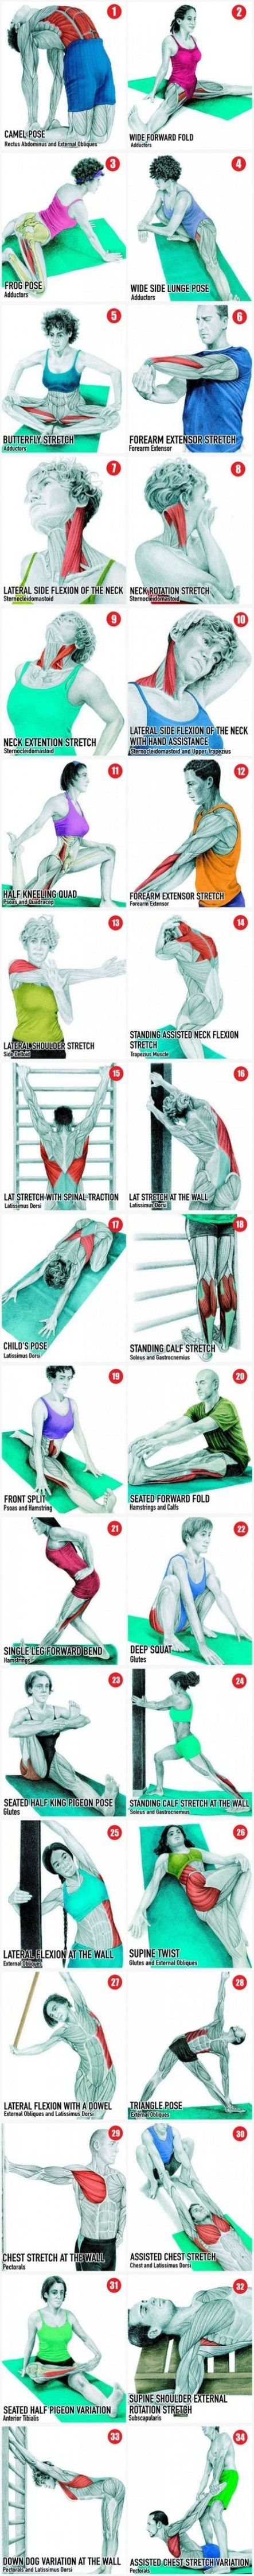 Fitness sport motivation health 17+ Ideas for 2019 #motivation #sport #fitness